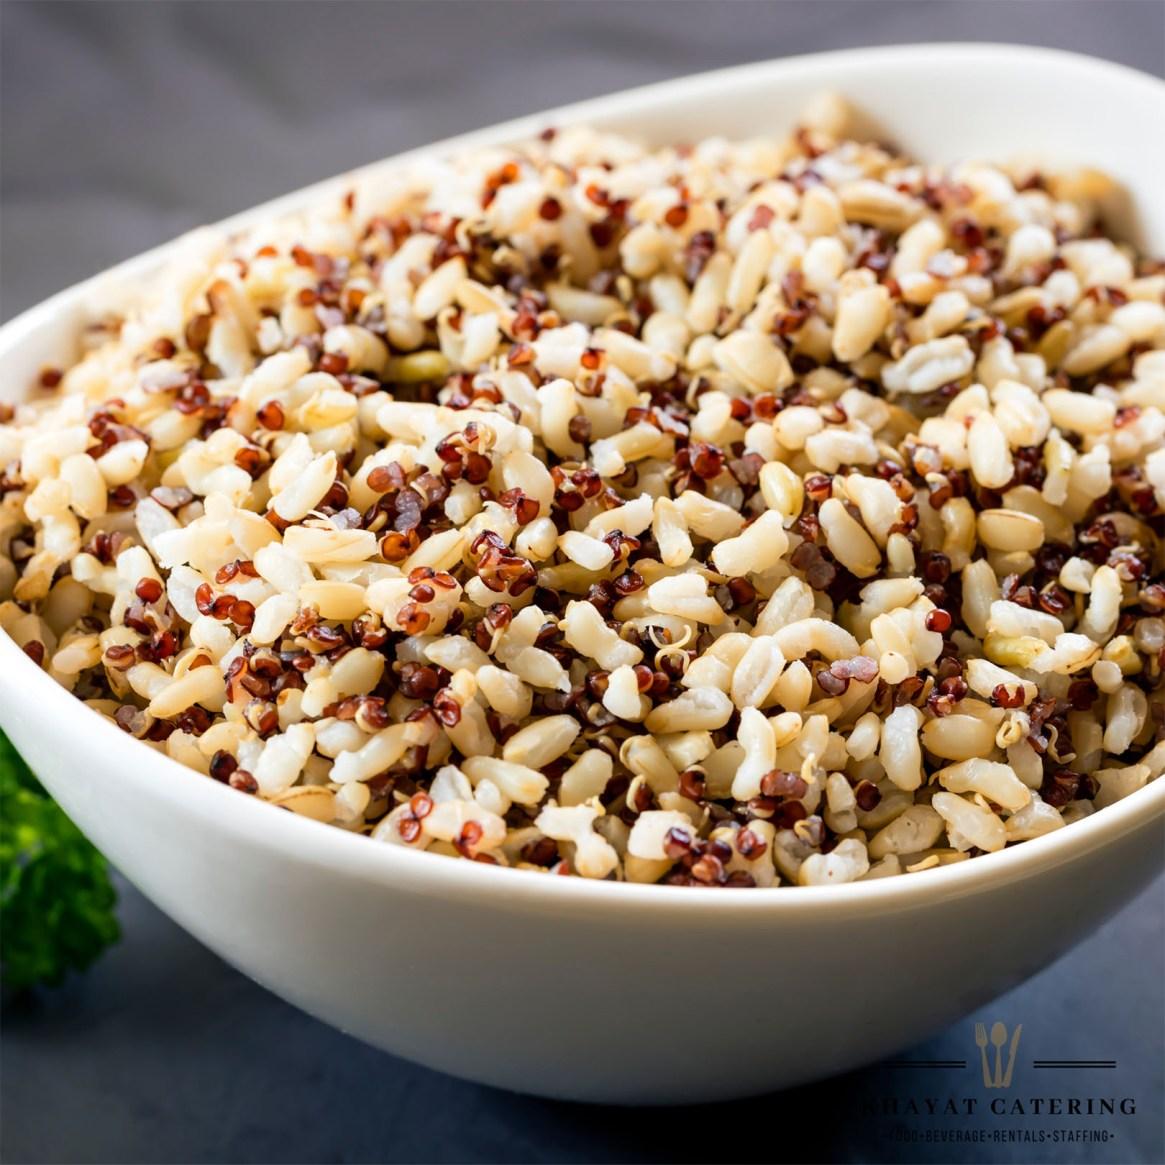 Khayat Catering quinoa